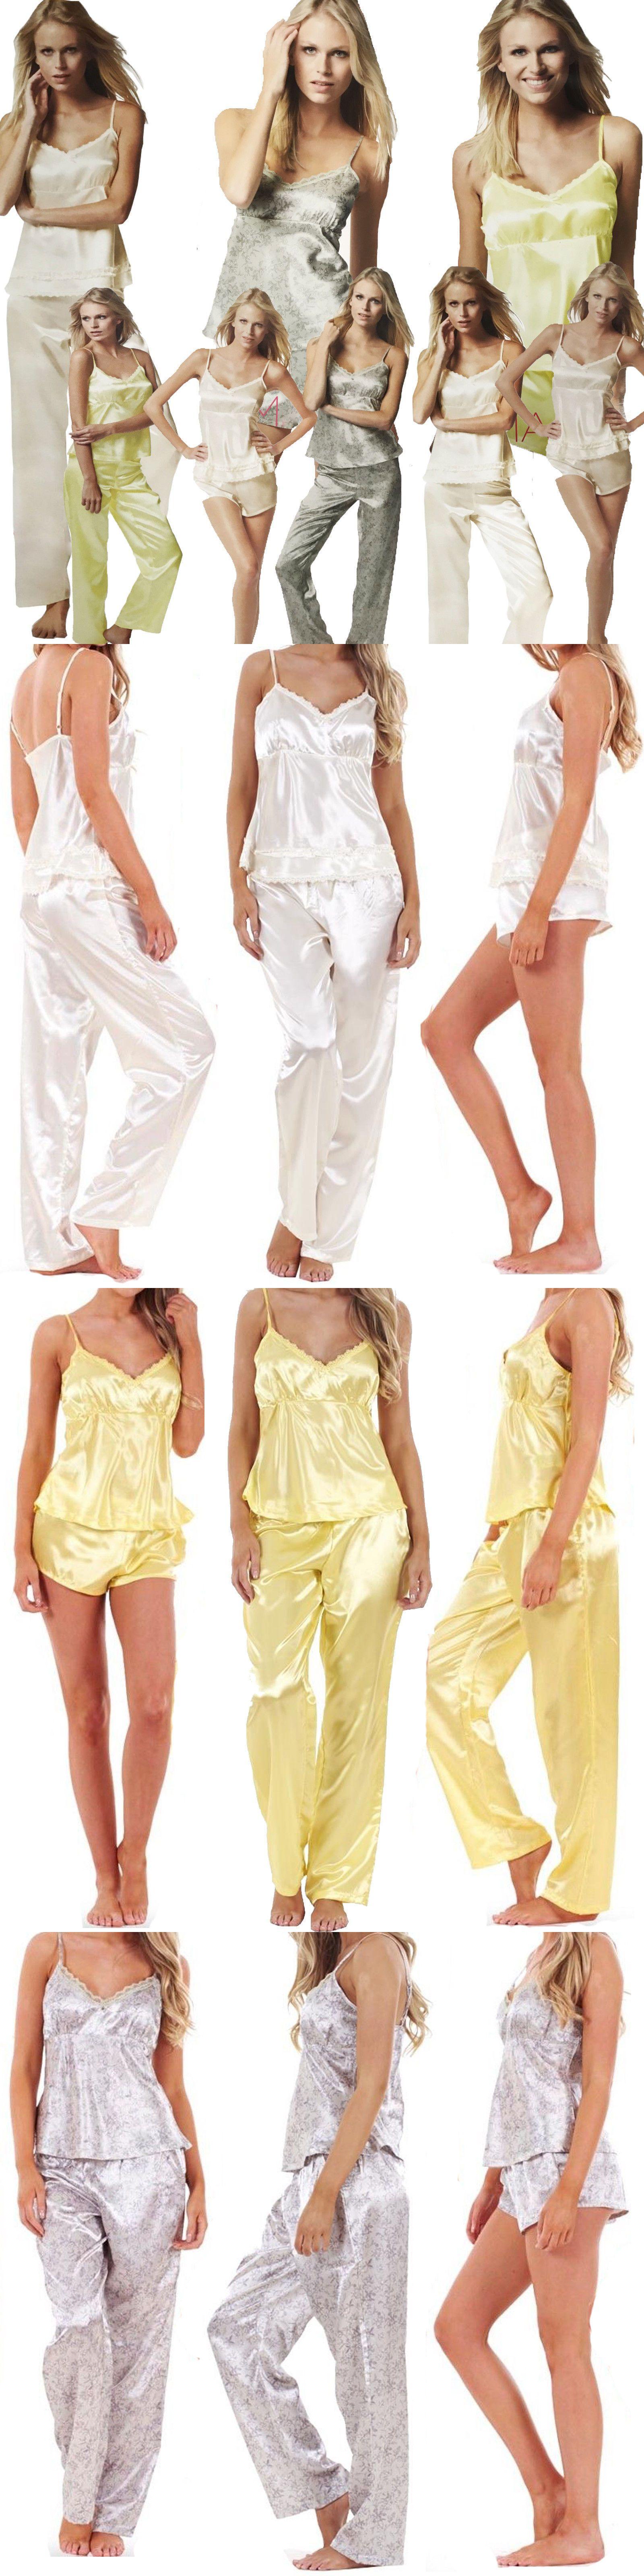 8bd8eec02b Sleepwear 117771  Ladies Women 3 Piece Satin Pyjama Set Vest Lace Shorts Pj  S Nightwear Nighty -  BUY IT NOW ONLY   9.95 on  eBay  sleepwear  ladies   women ...